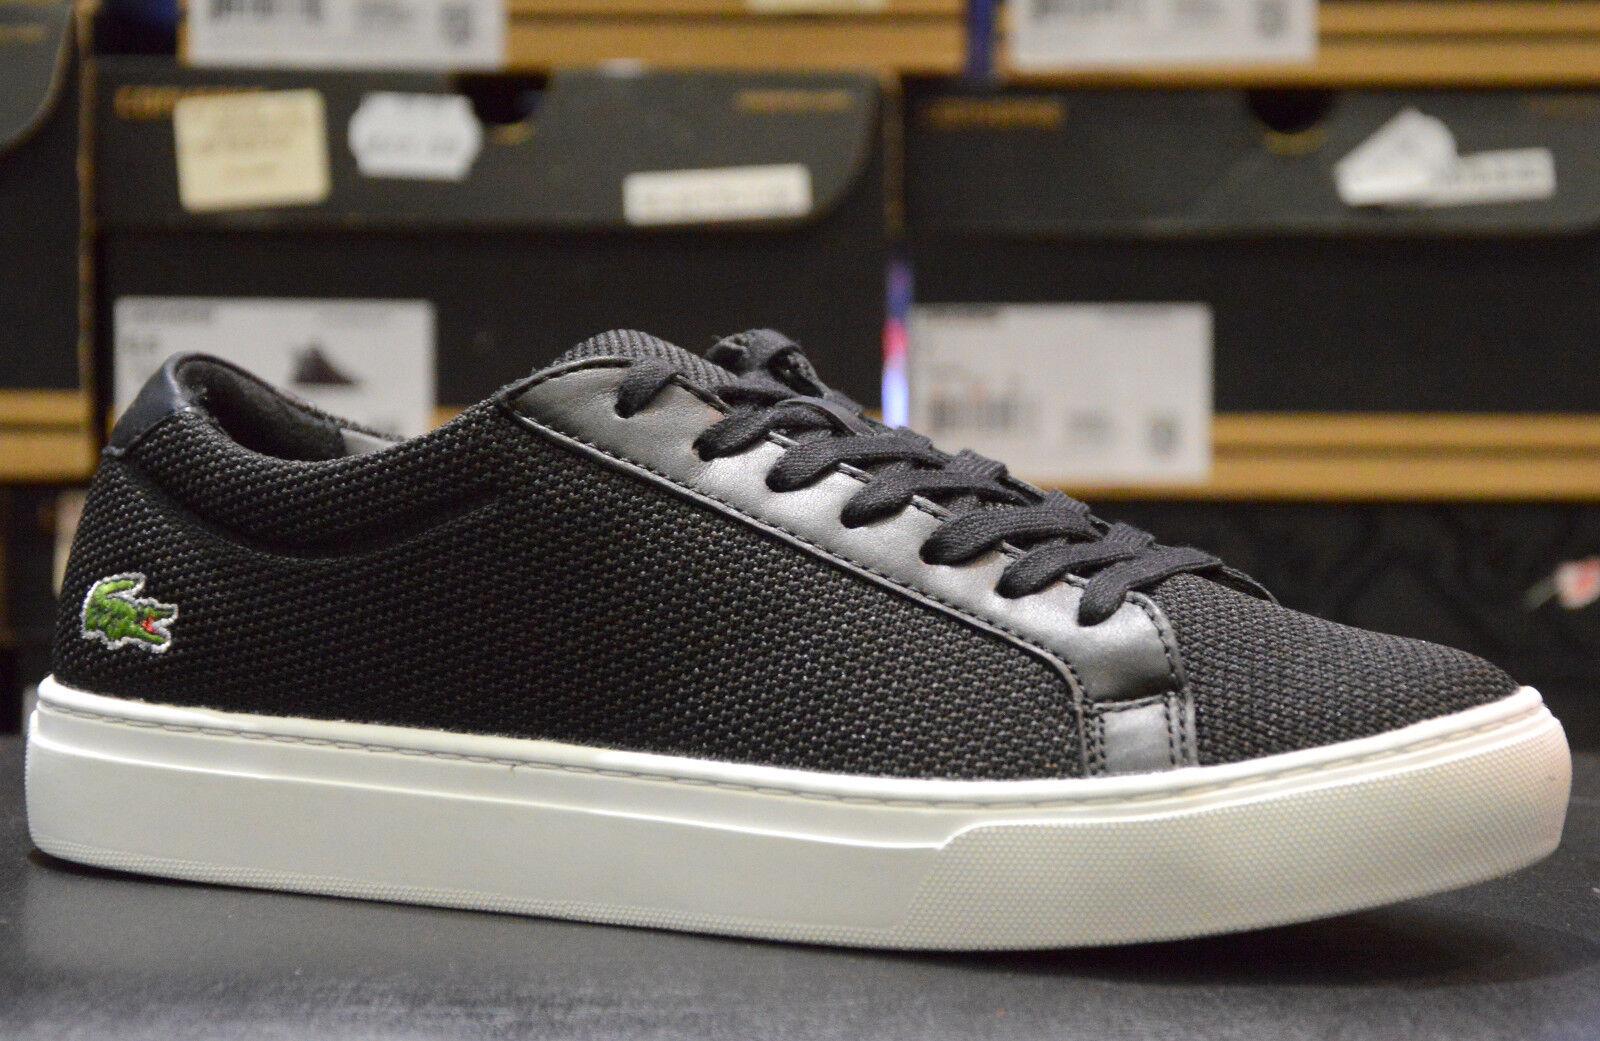 Lacoste Herrenschuhe Damenschuhe Sneaker Turnschuhe Leder Schwarz Textil